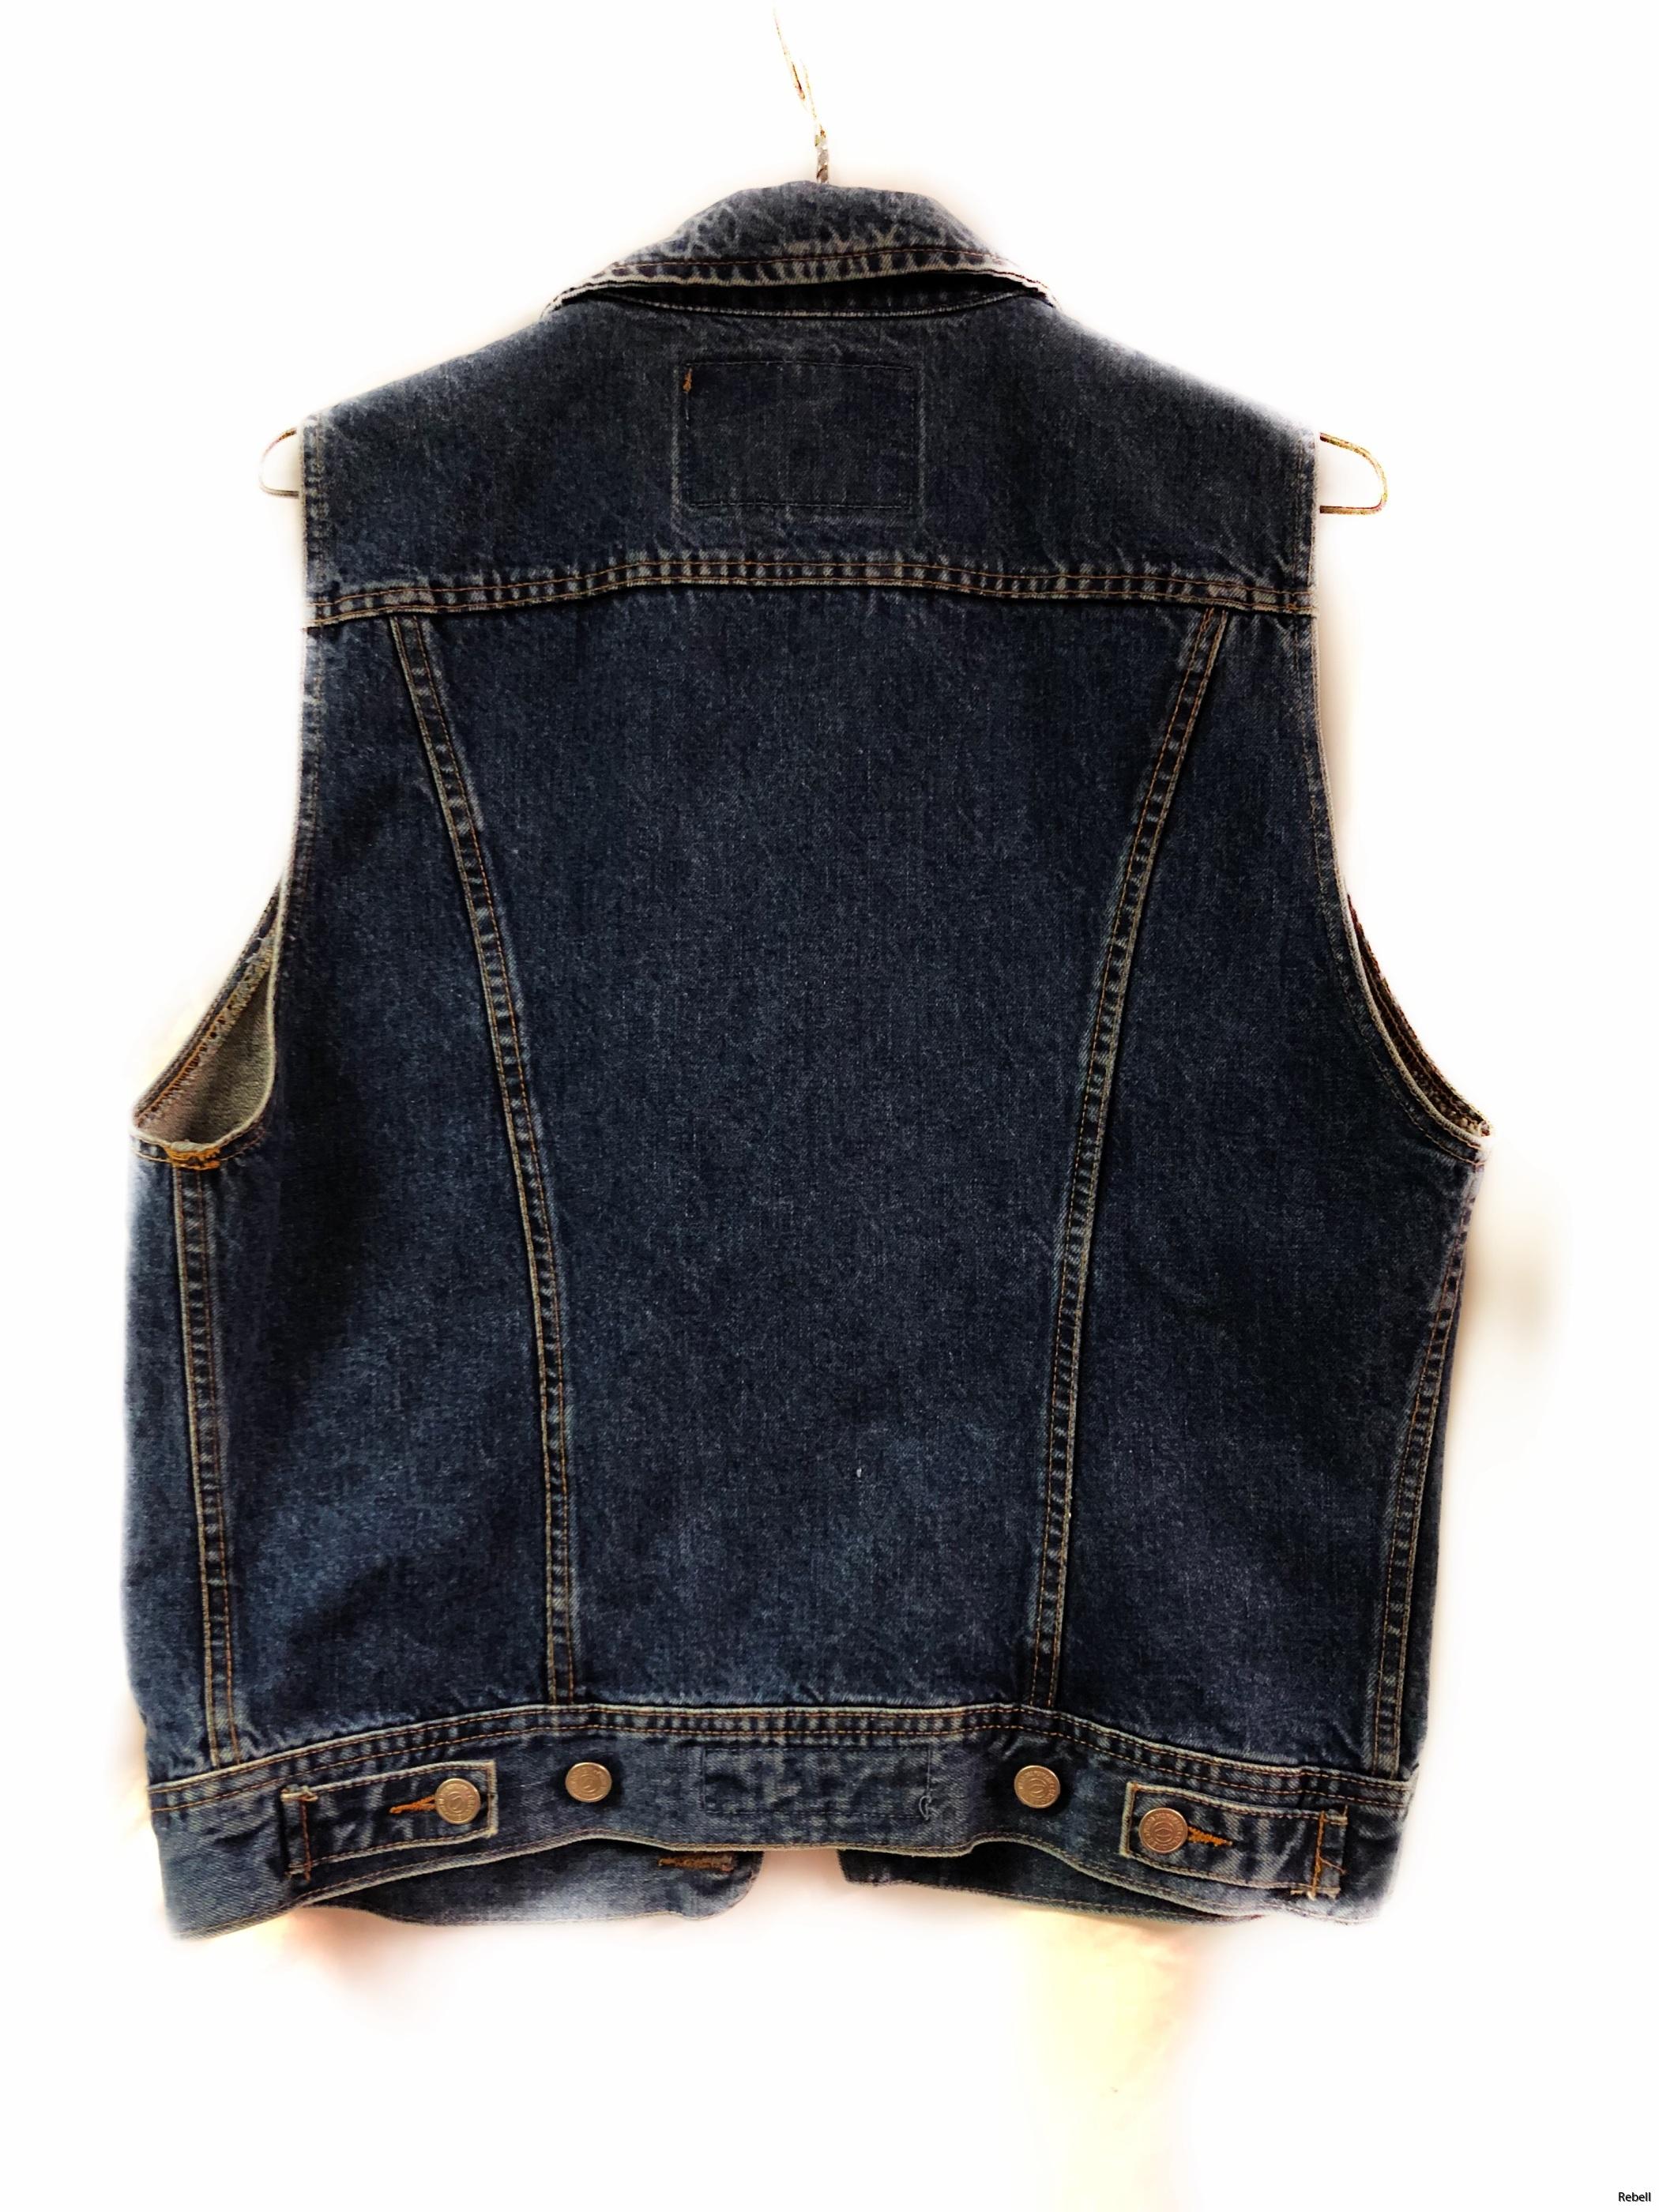 crocker crockerväst crockerjeansväst rebell rebellclothes vintage